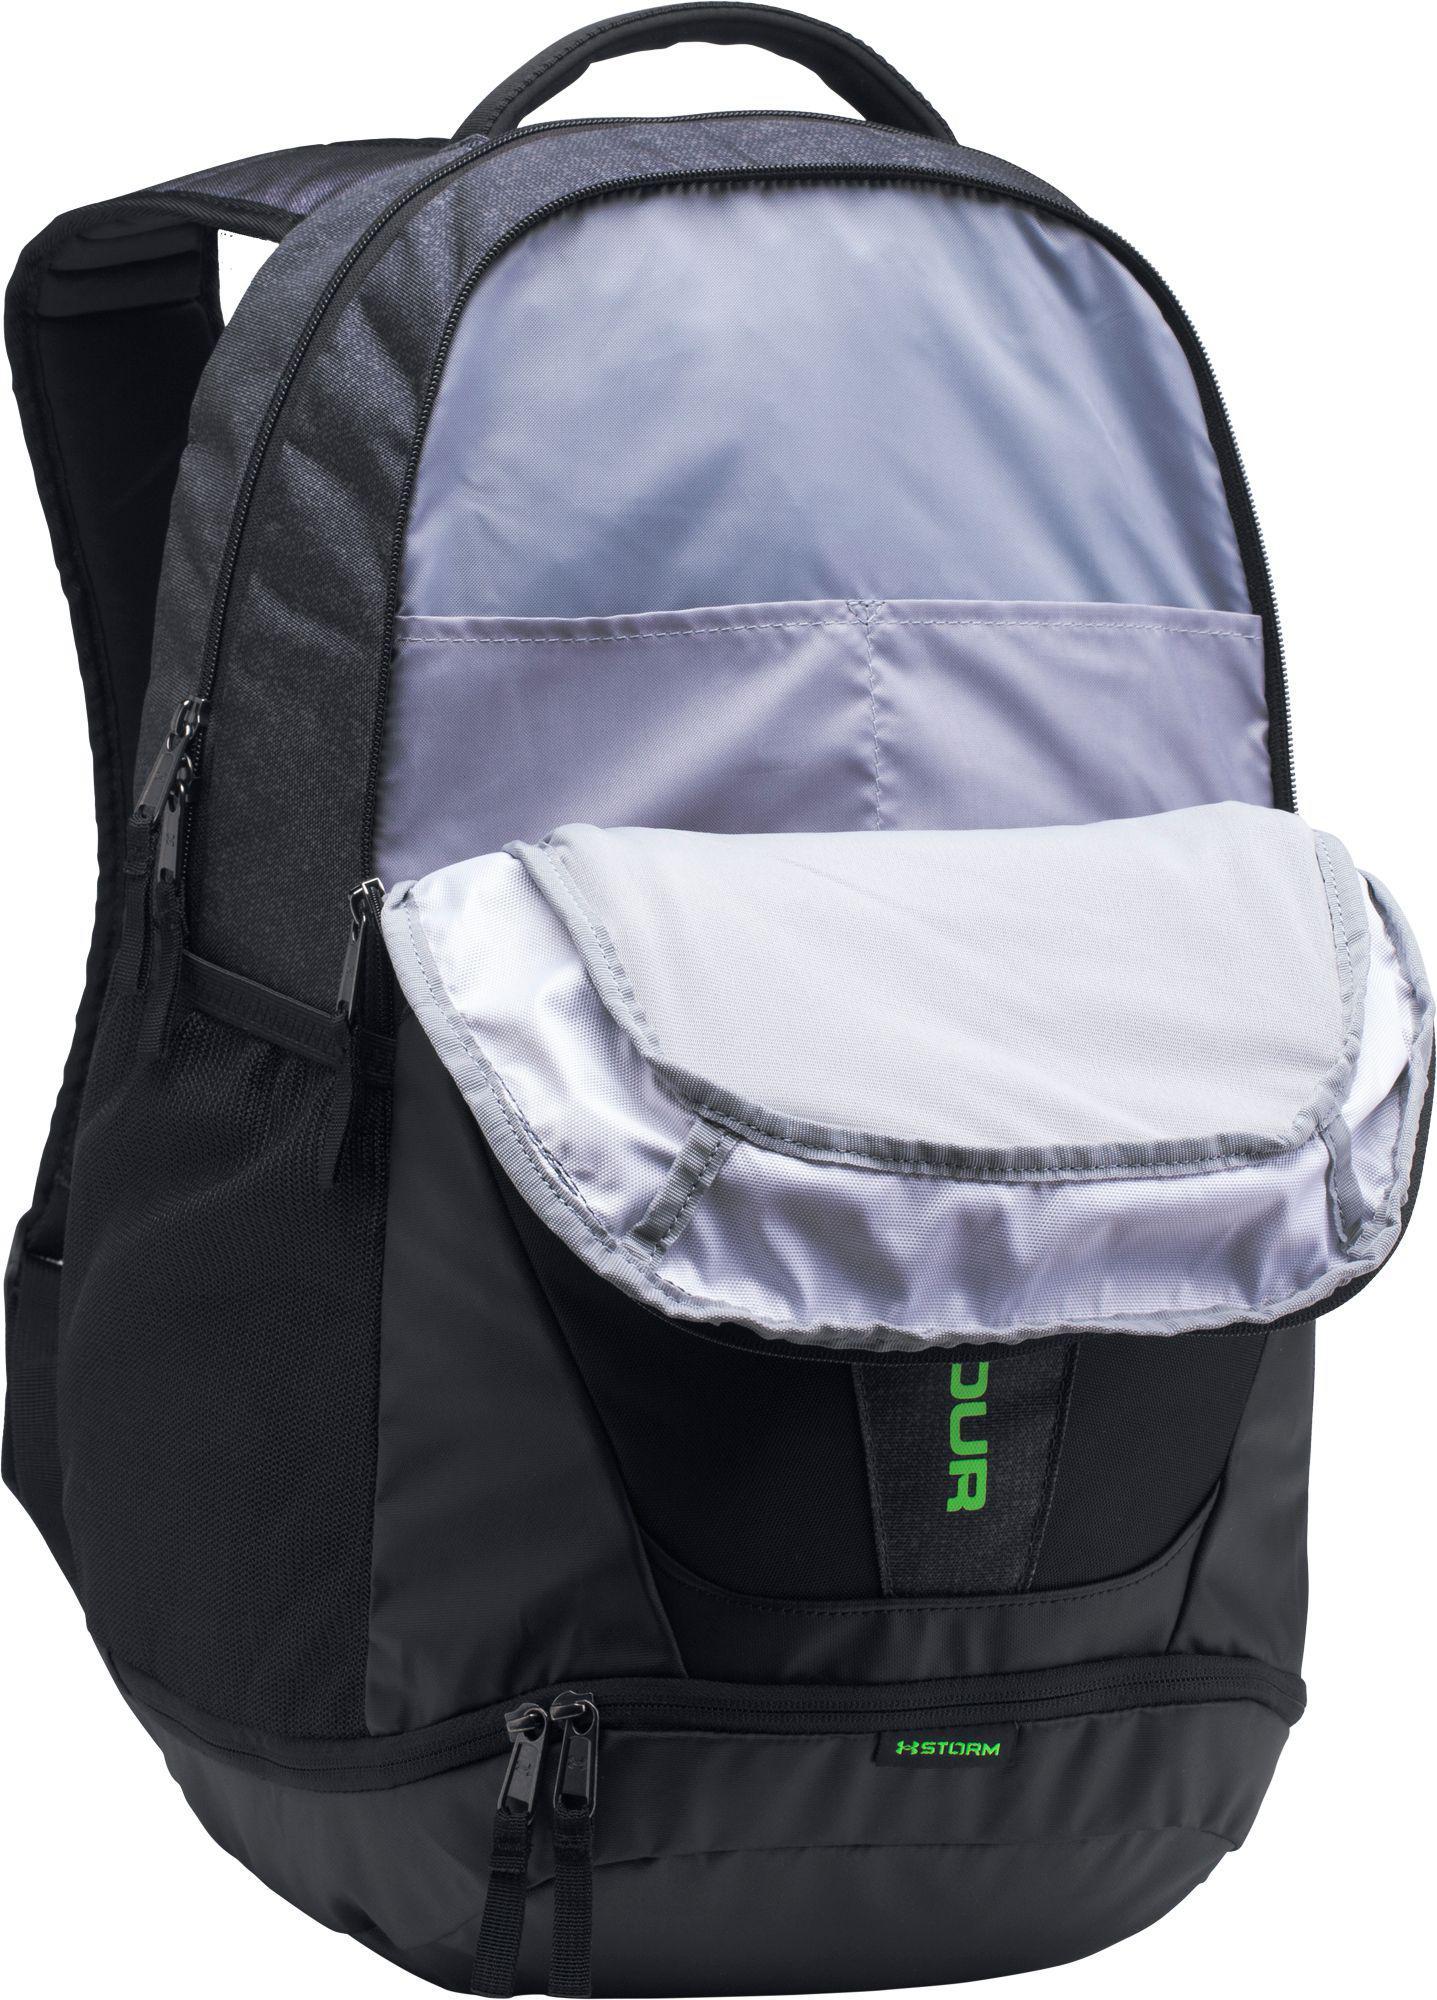 31864e92e4a4 Under Armour - Multicolor Hustle 3.0 Backpack for Men - Lyst